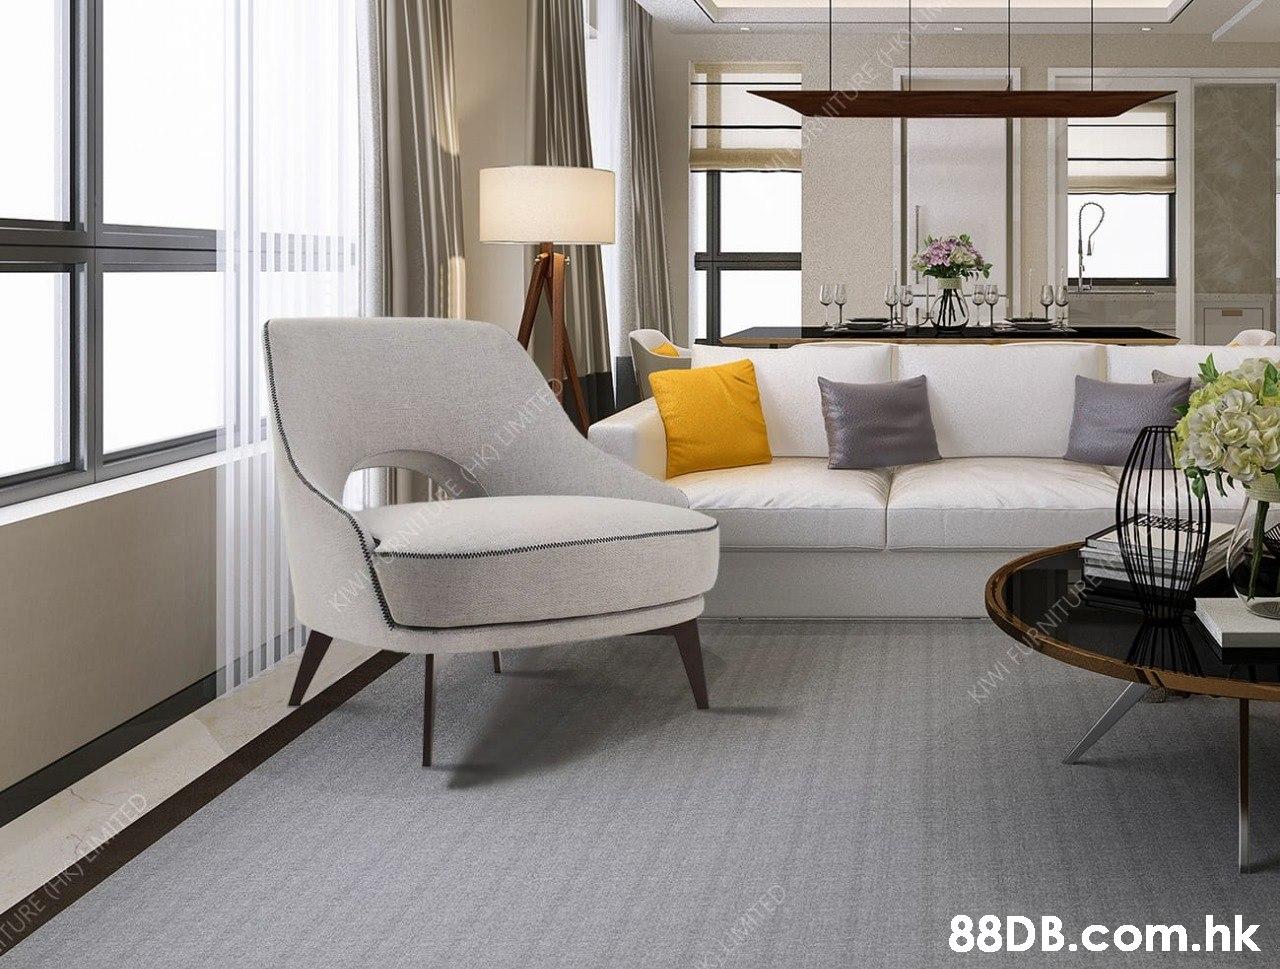 TORE (HA KIWN E (HK) LIMITED oATED .hk YURE (H) EIMITED KIWI FURNITURA  Living room,Room,Furniture,Interior design,Floor